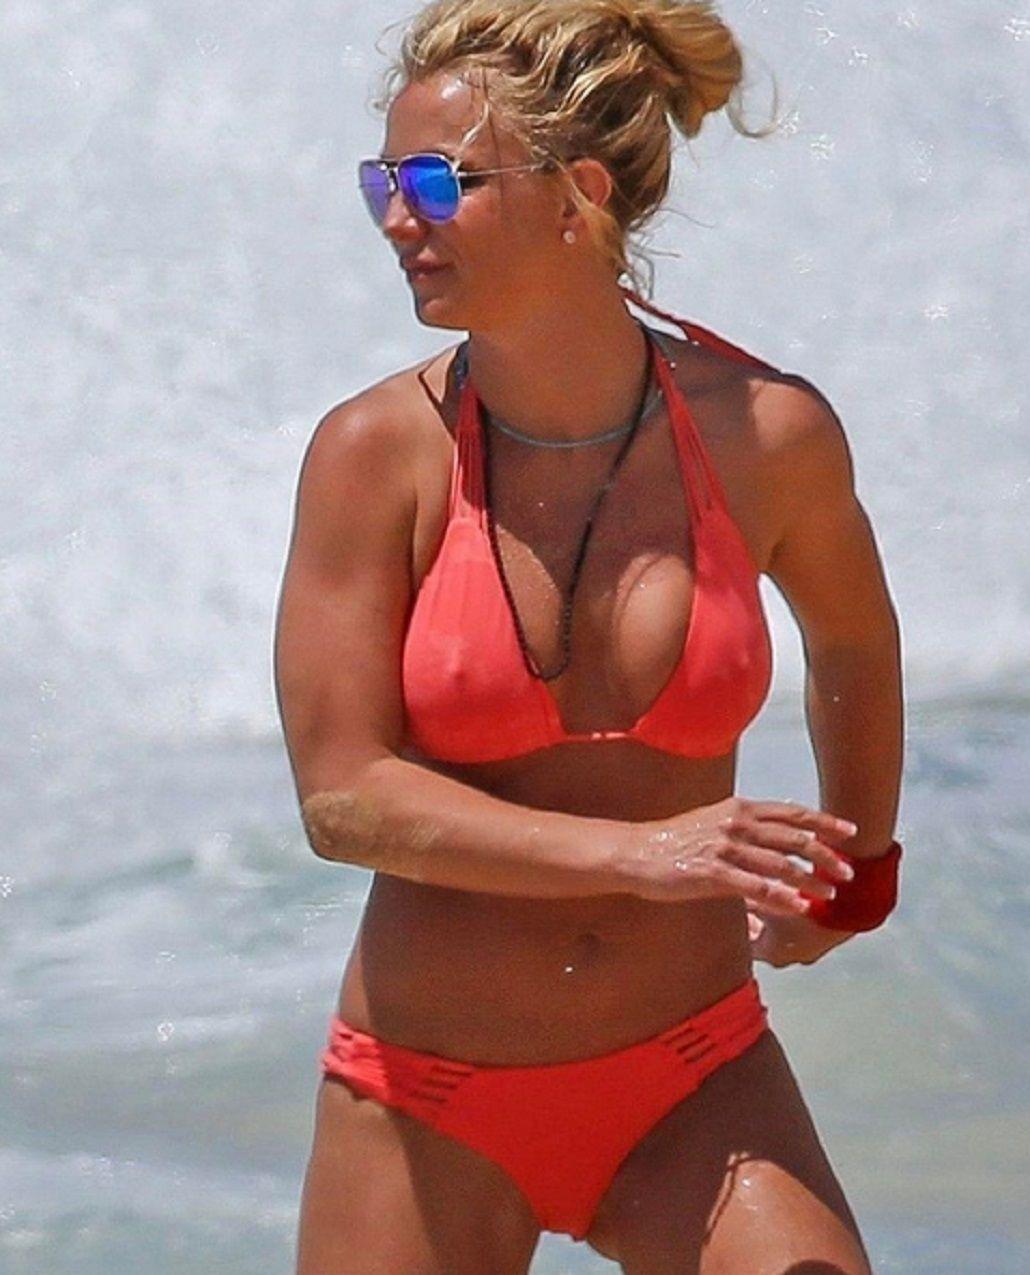 Britney Spears y una foto al límite con la bikini mojada